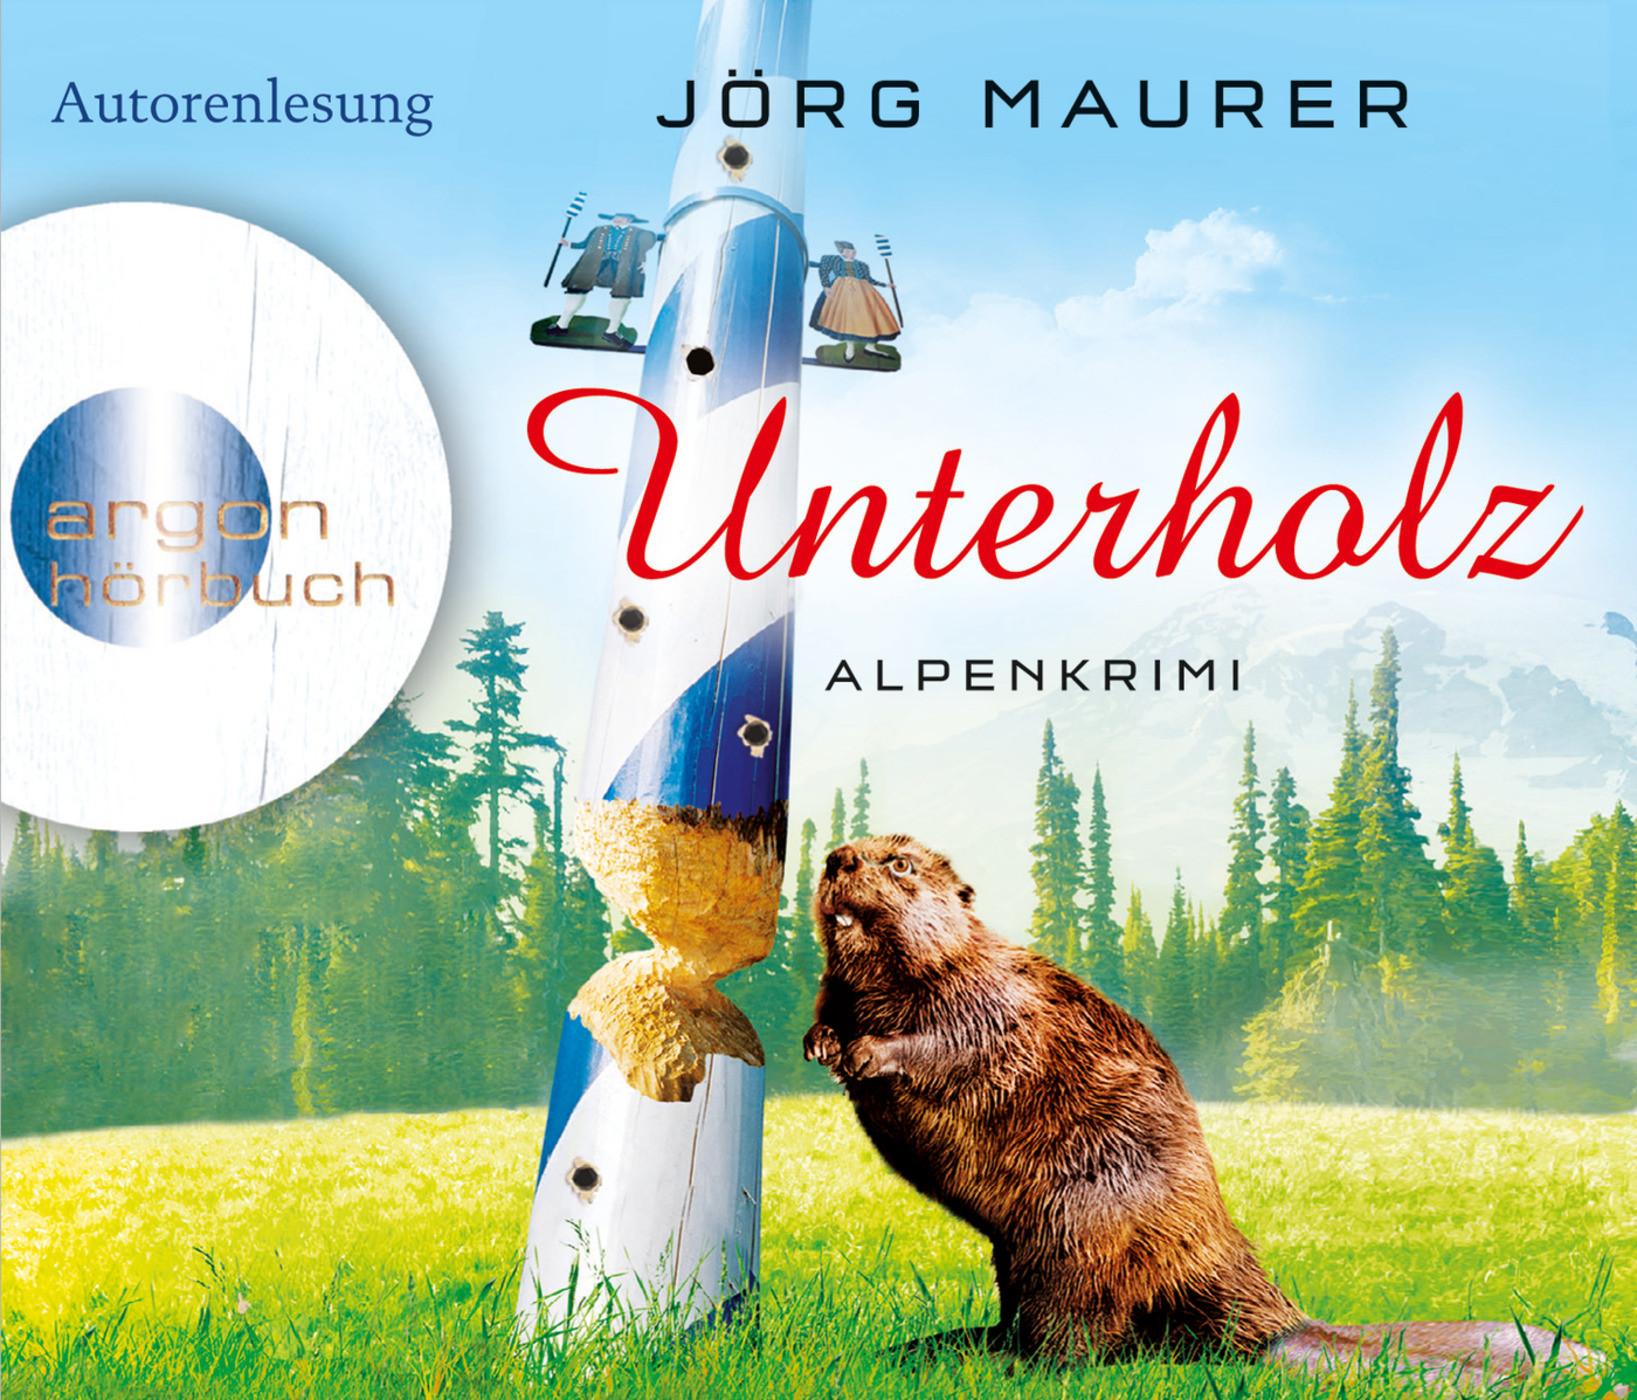 Jörg Maurer - Unterholz: Alpenkrimi (Hörbestseller)